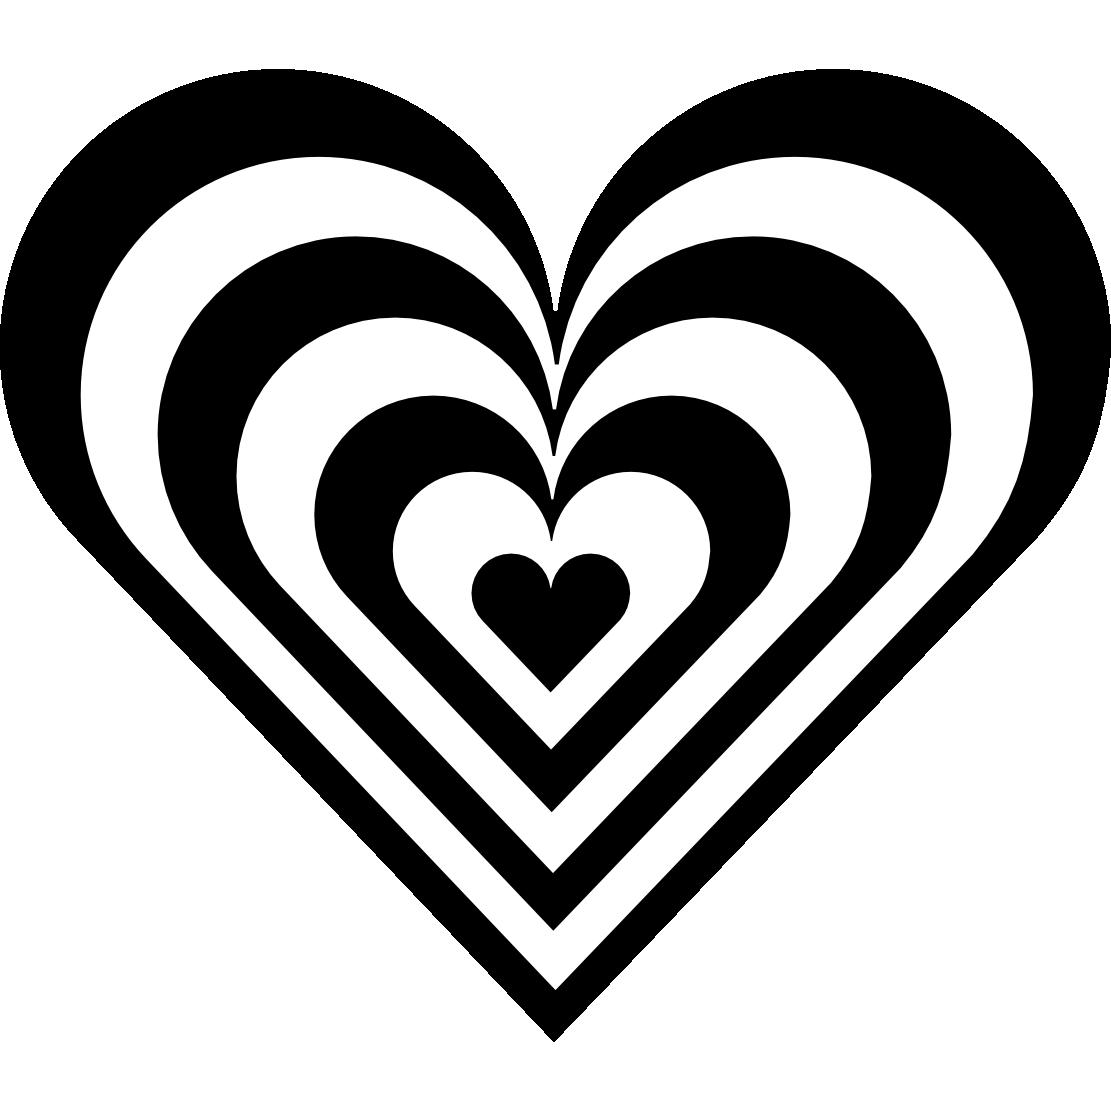 heart%20clip%20art%20black%20and%20white